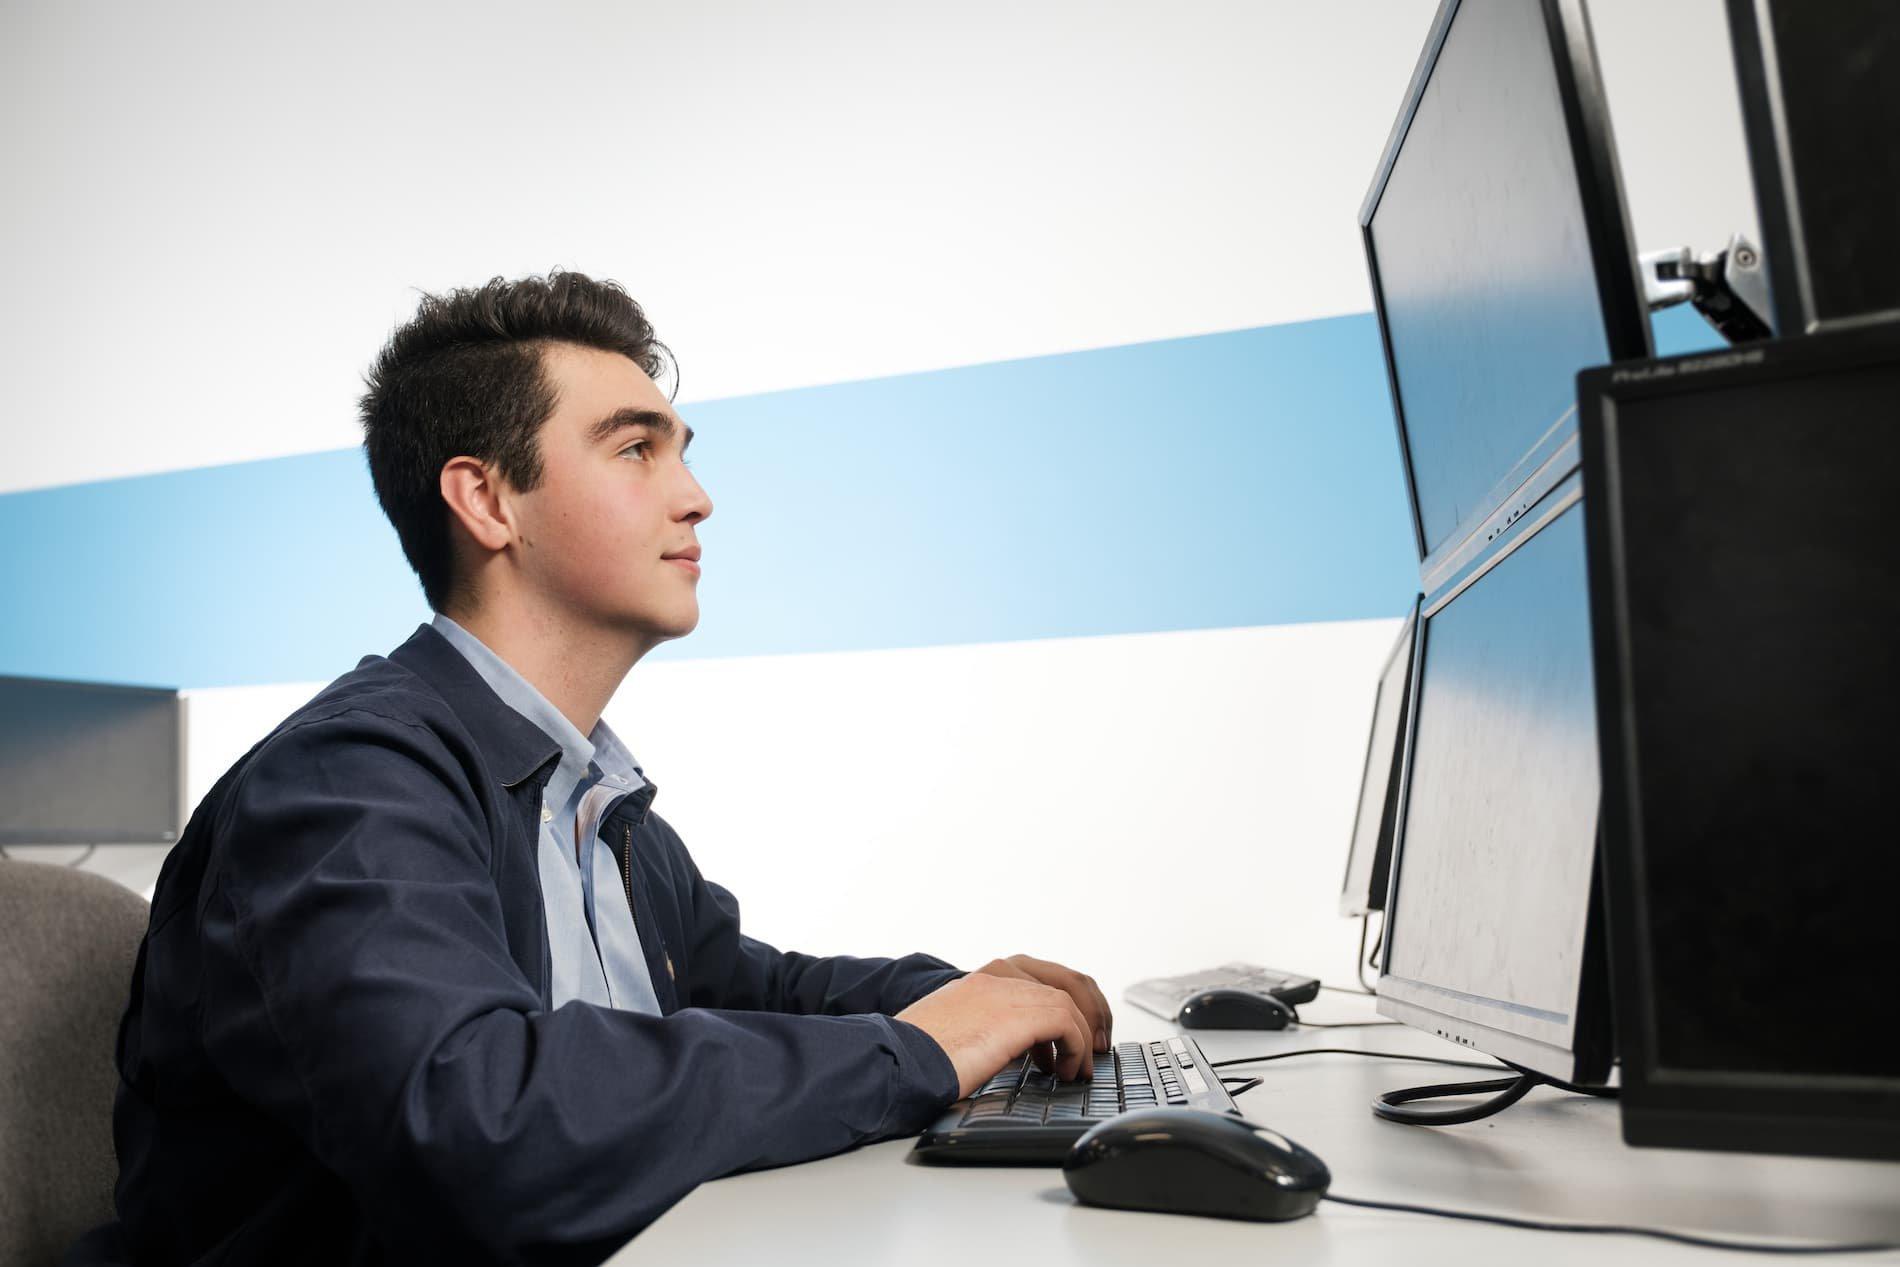 Kaan Uyduran, Computer Science